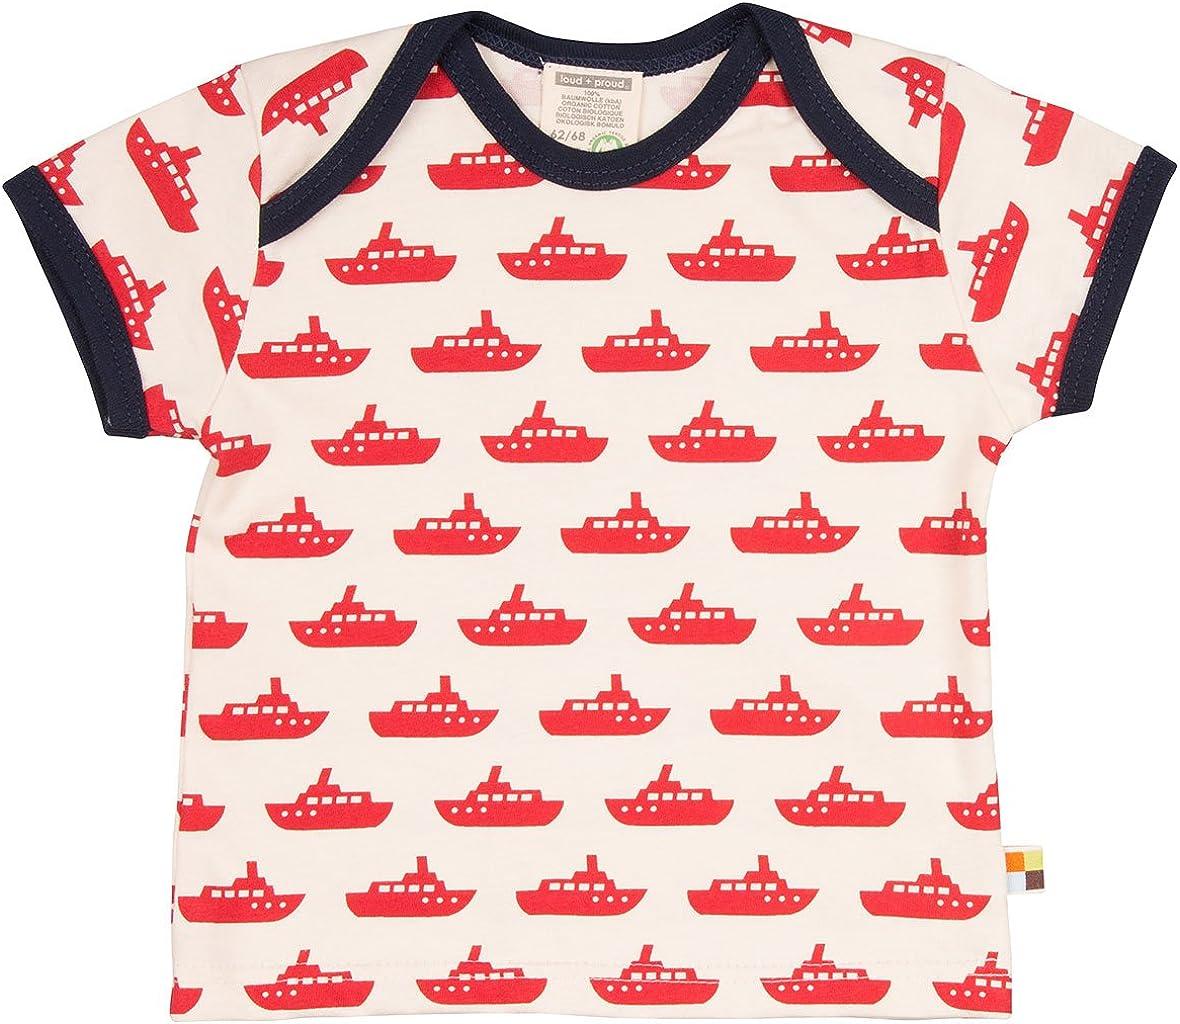 proud T-Shirt Druck Unisex-Bimbi loud